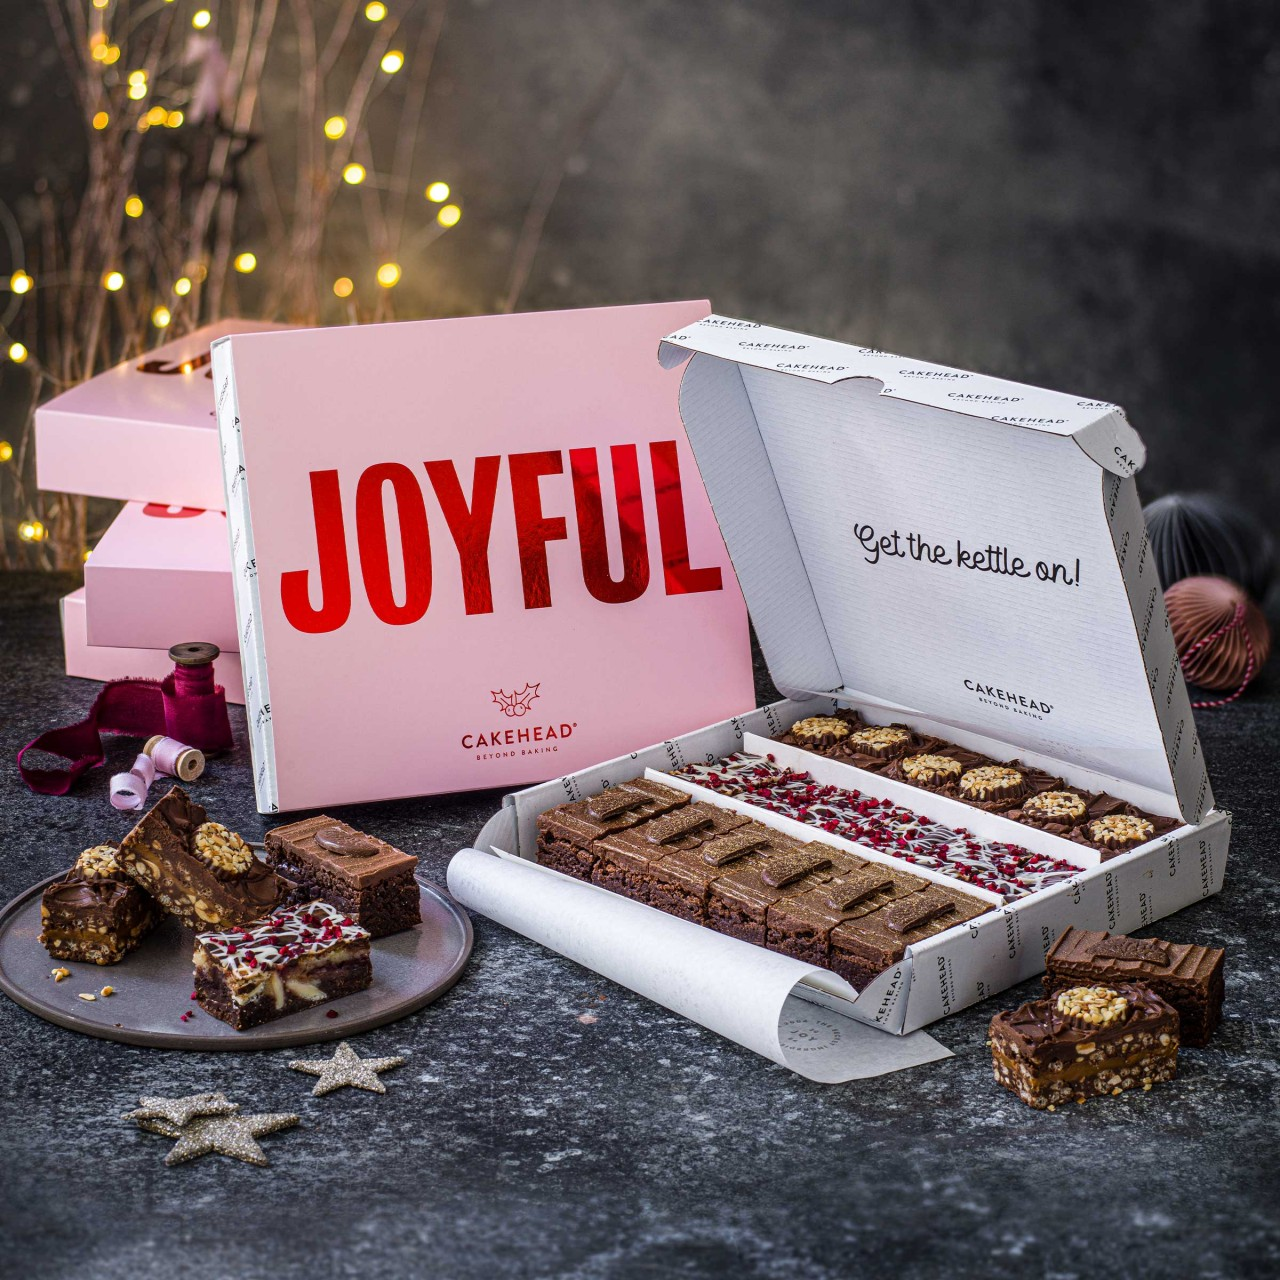 The Christmas Joyful Box - Image